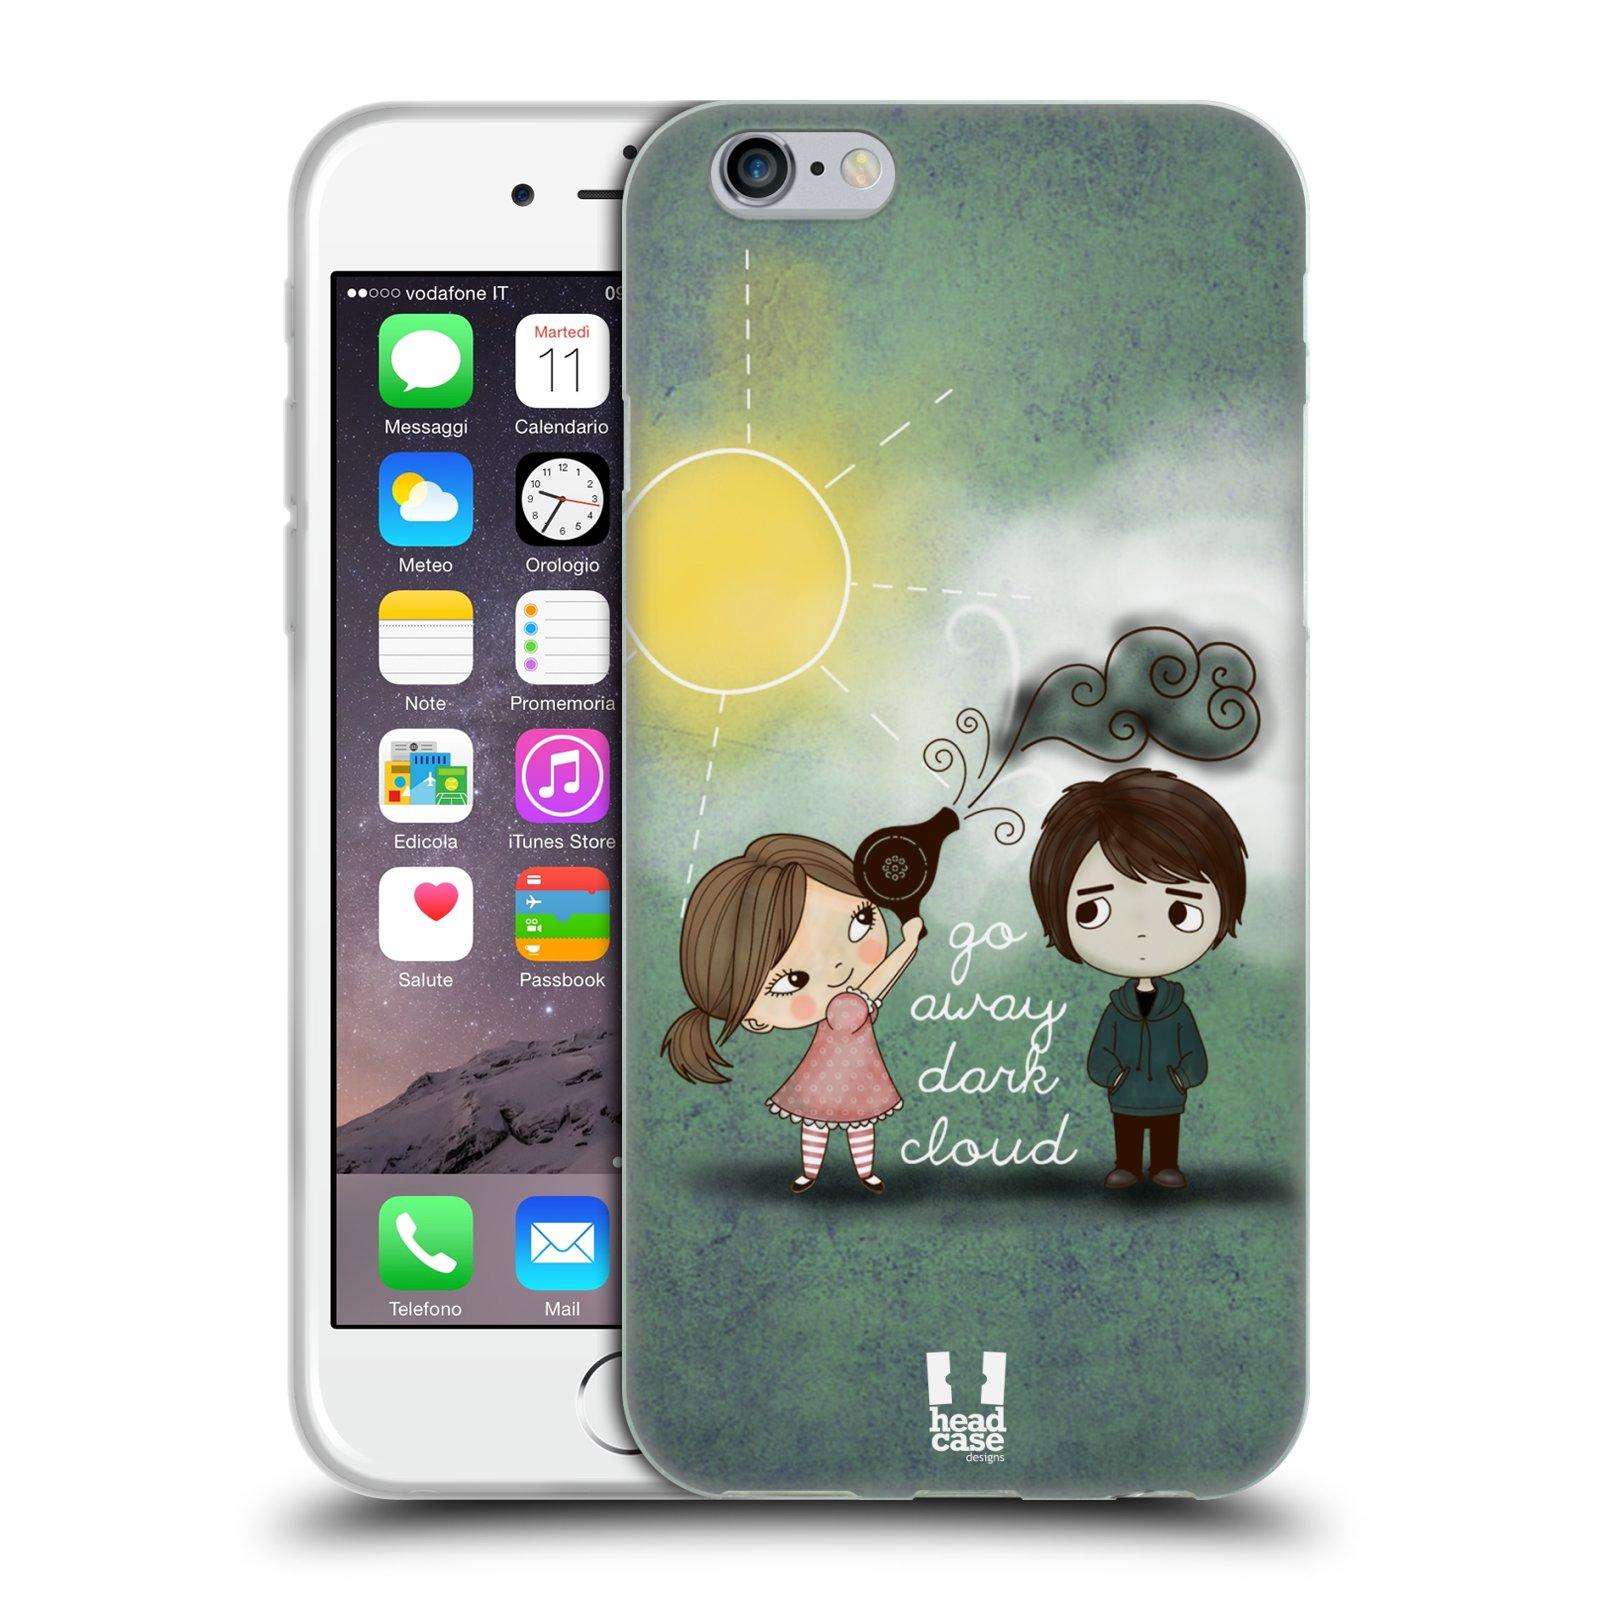 Silikonové pouzdro na mobil Apple iPhone 6 a 6S HEAD CASE Emo Love na  Sluníčku ( 89c71d8aa31